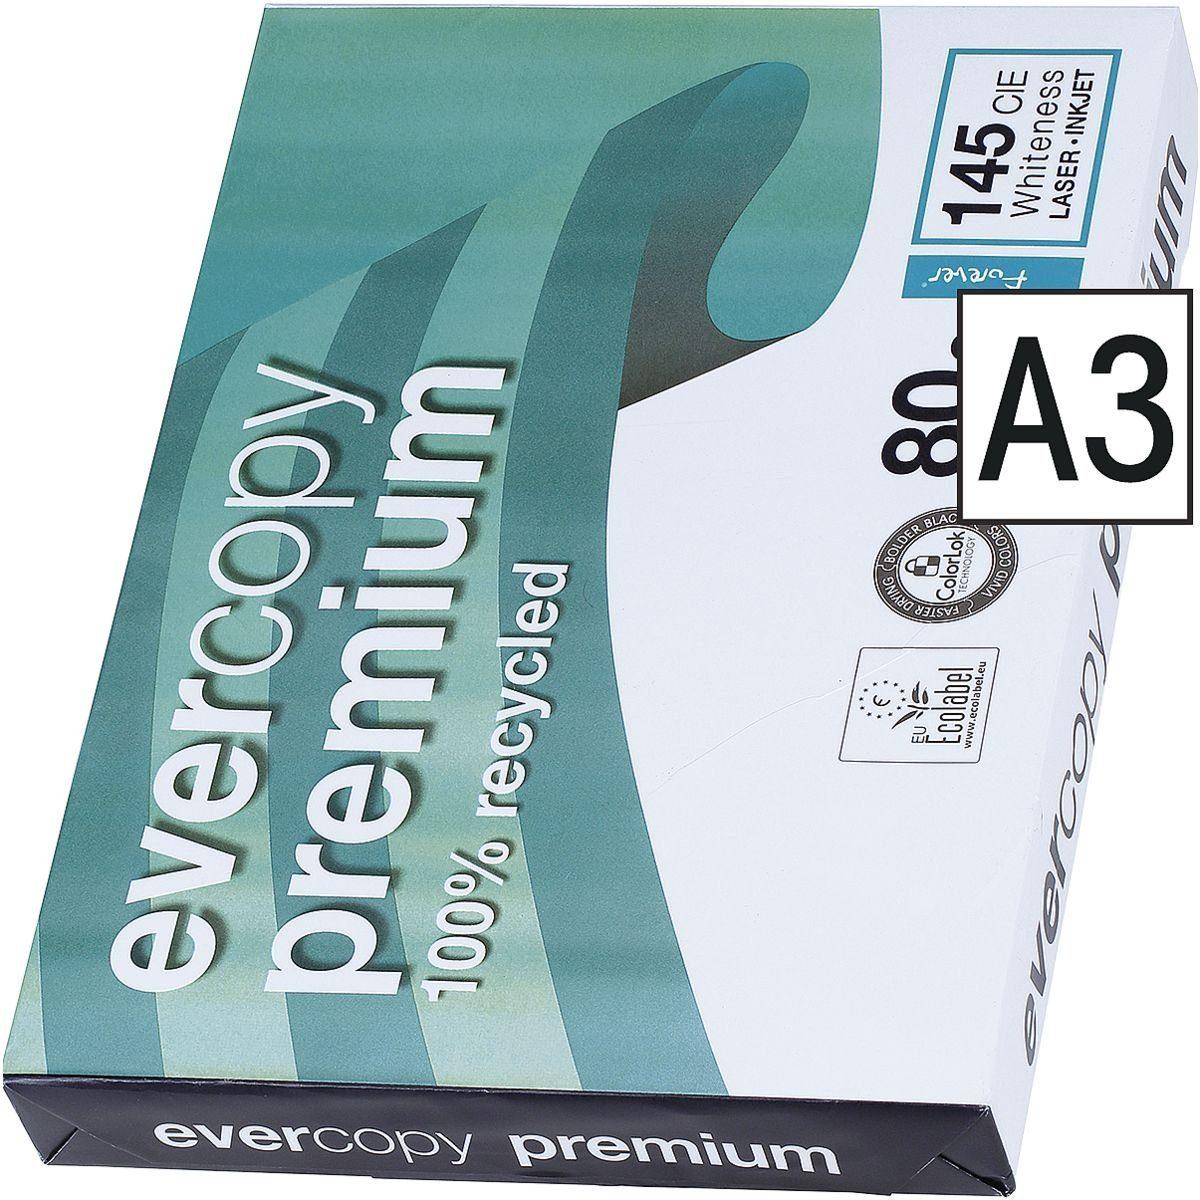 CLAIREFONTAINE Recycling Kopierpapier A3 500 Blatt »Everycopy Premium«